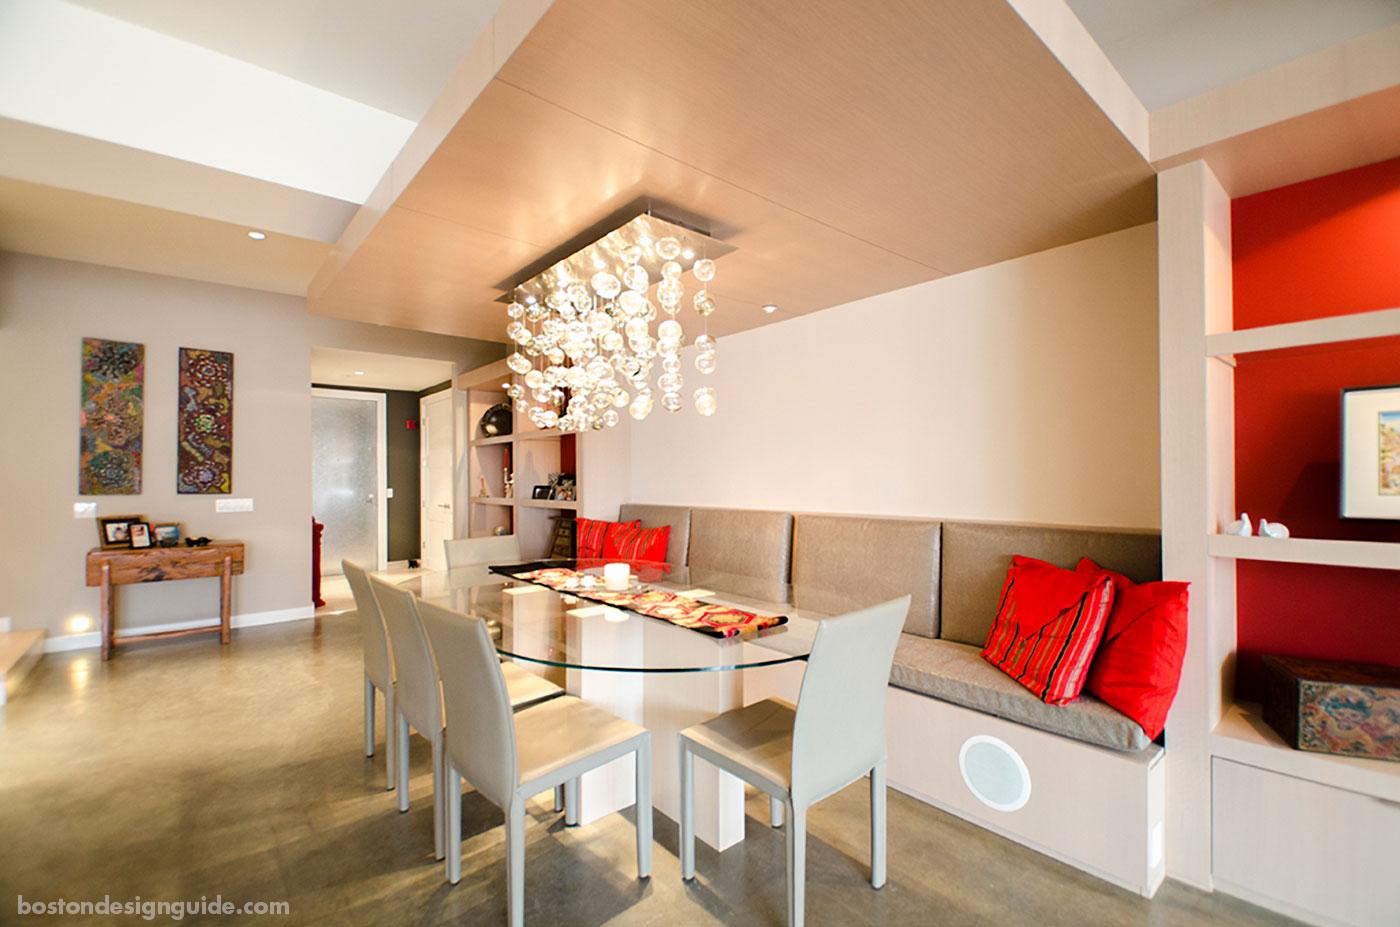 Modern custom kitchen by Sleeping Dog Properties, Inc